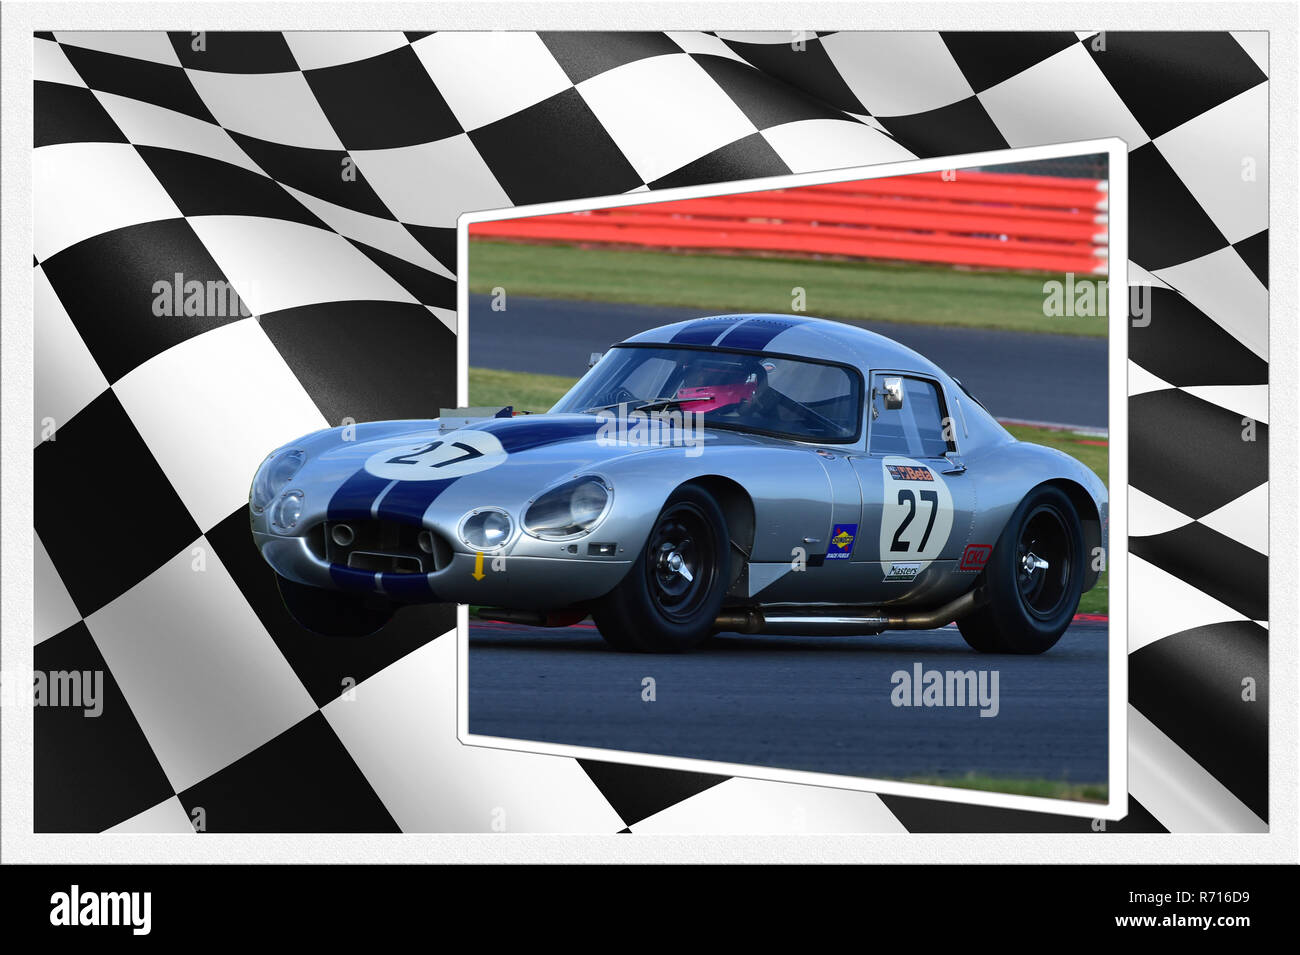 Gisella Ketvel, Jaguar E-Type, International Trophy for Classic GT Cars, Silverstone Classic 2015, cars, Chris McEvoy, circuit racing, cjm-photography - Stock Image